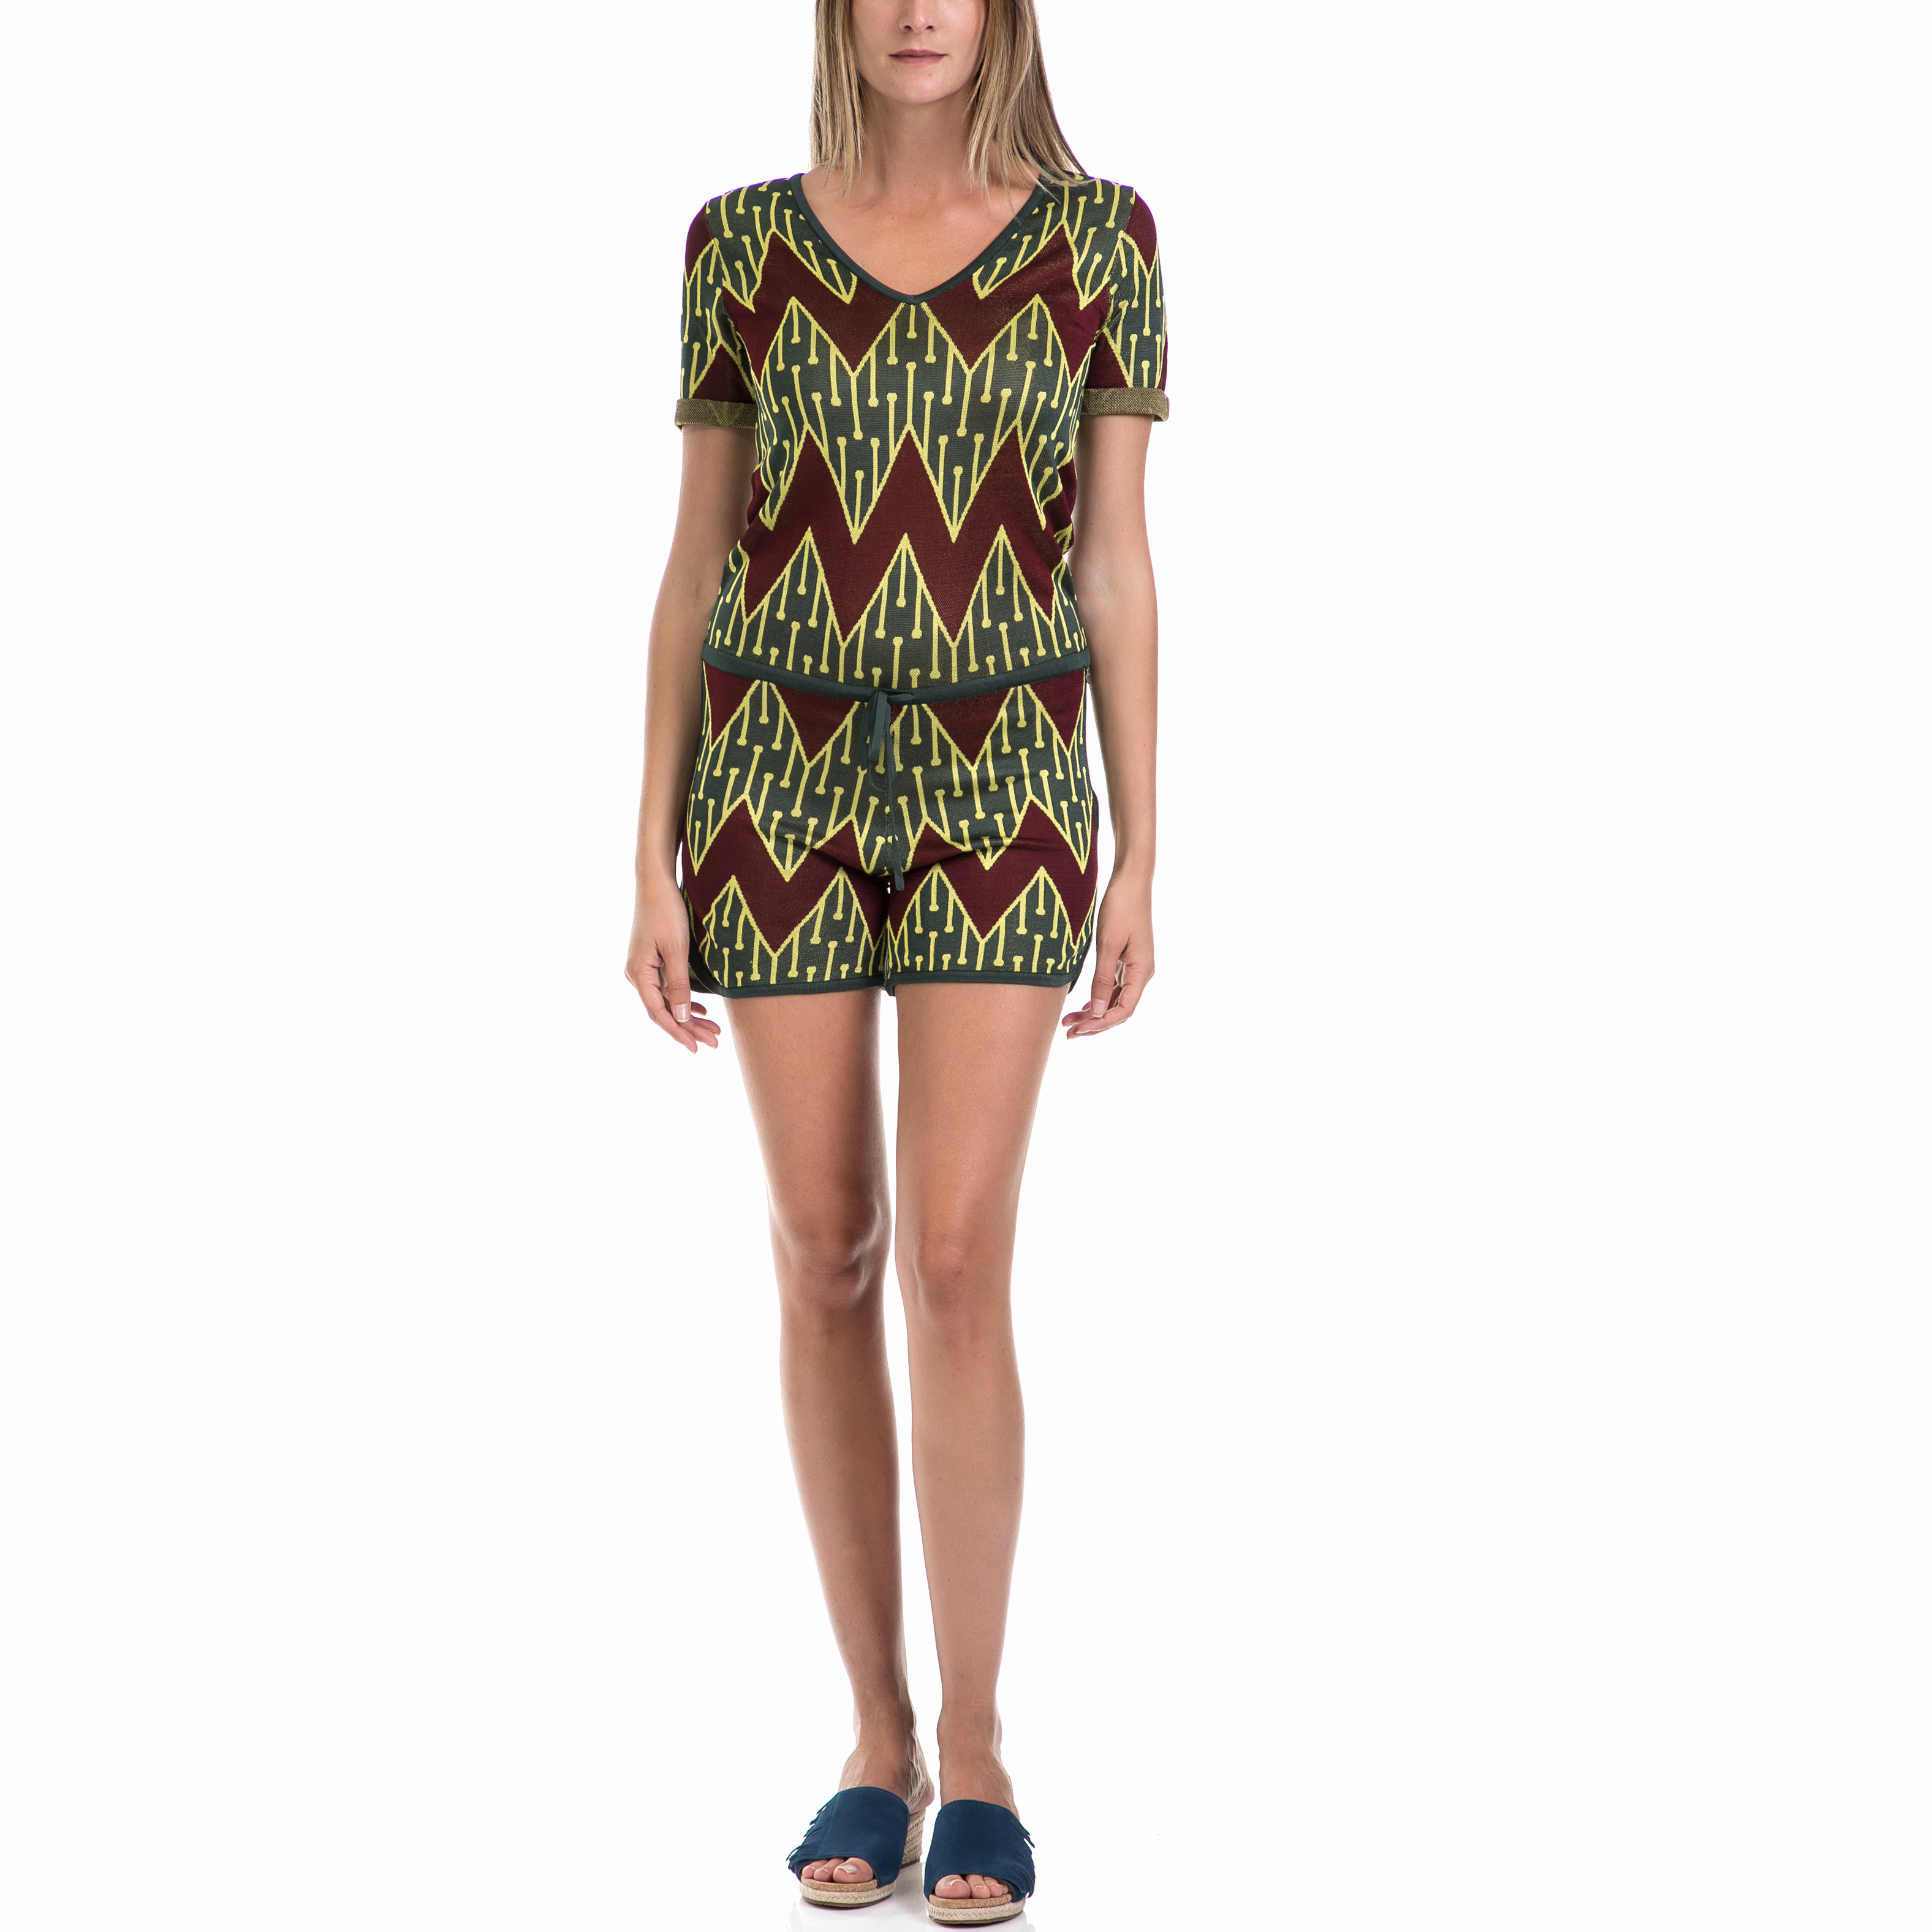 SCOTCH   SODA - Γυναικεία ολόσωμη φόρμα MAISON SCOTCH πράσινη-καφέ 7222d66caf0